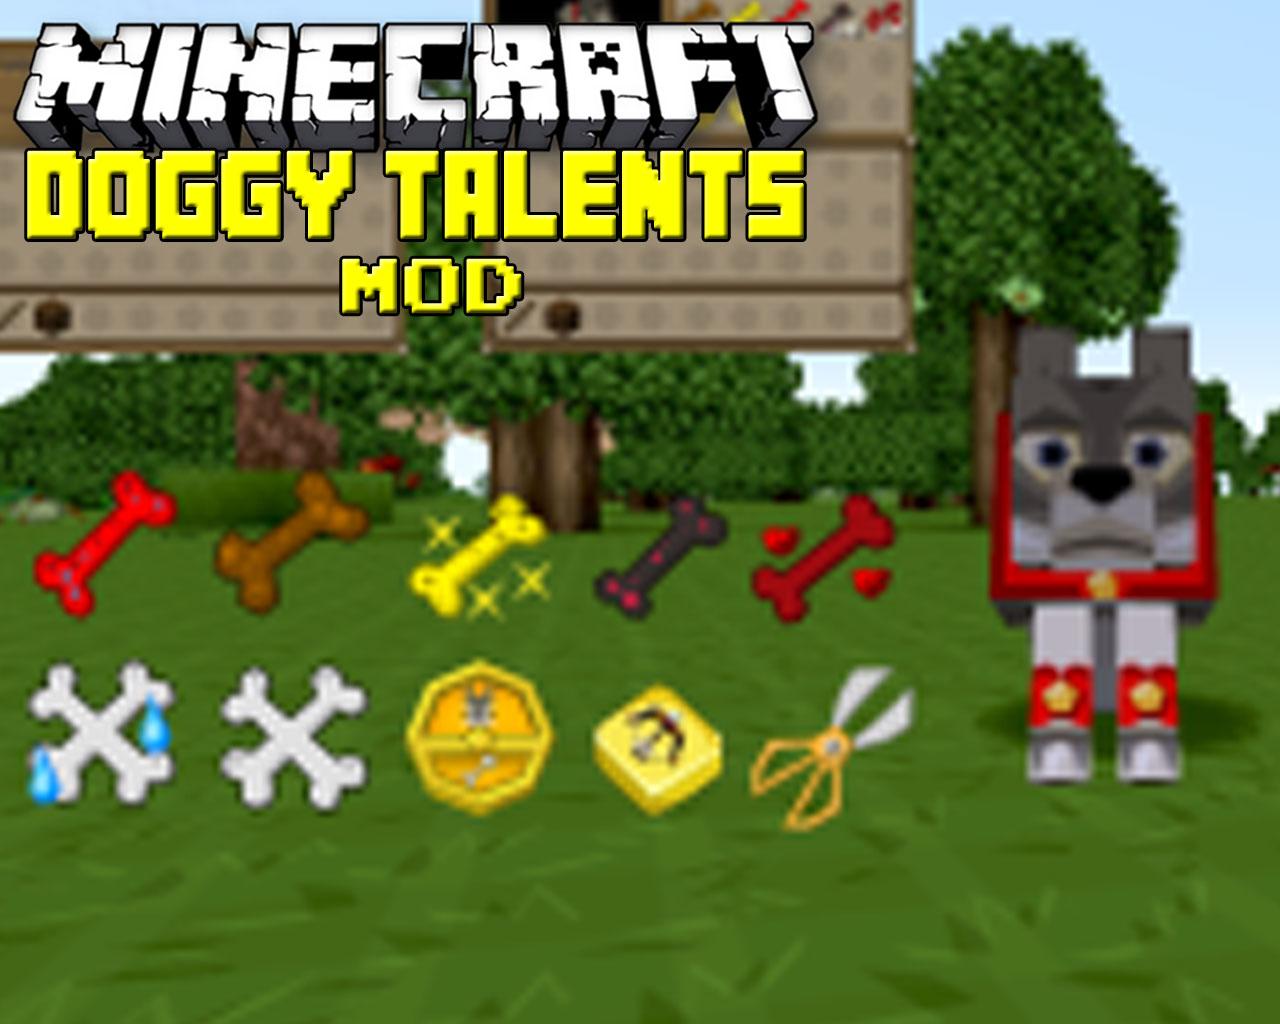 Doggy Talents Mod 1.16.4/1.13.2